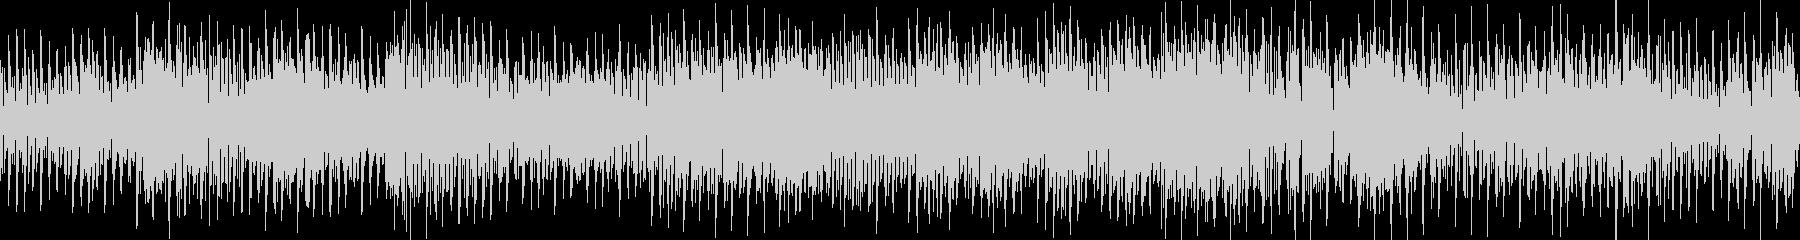 EDM ボイス ダンス 激しい ループの未再生の波形